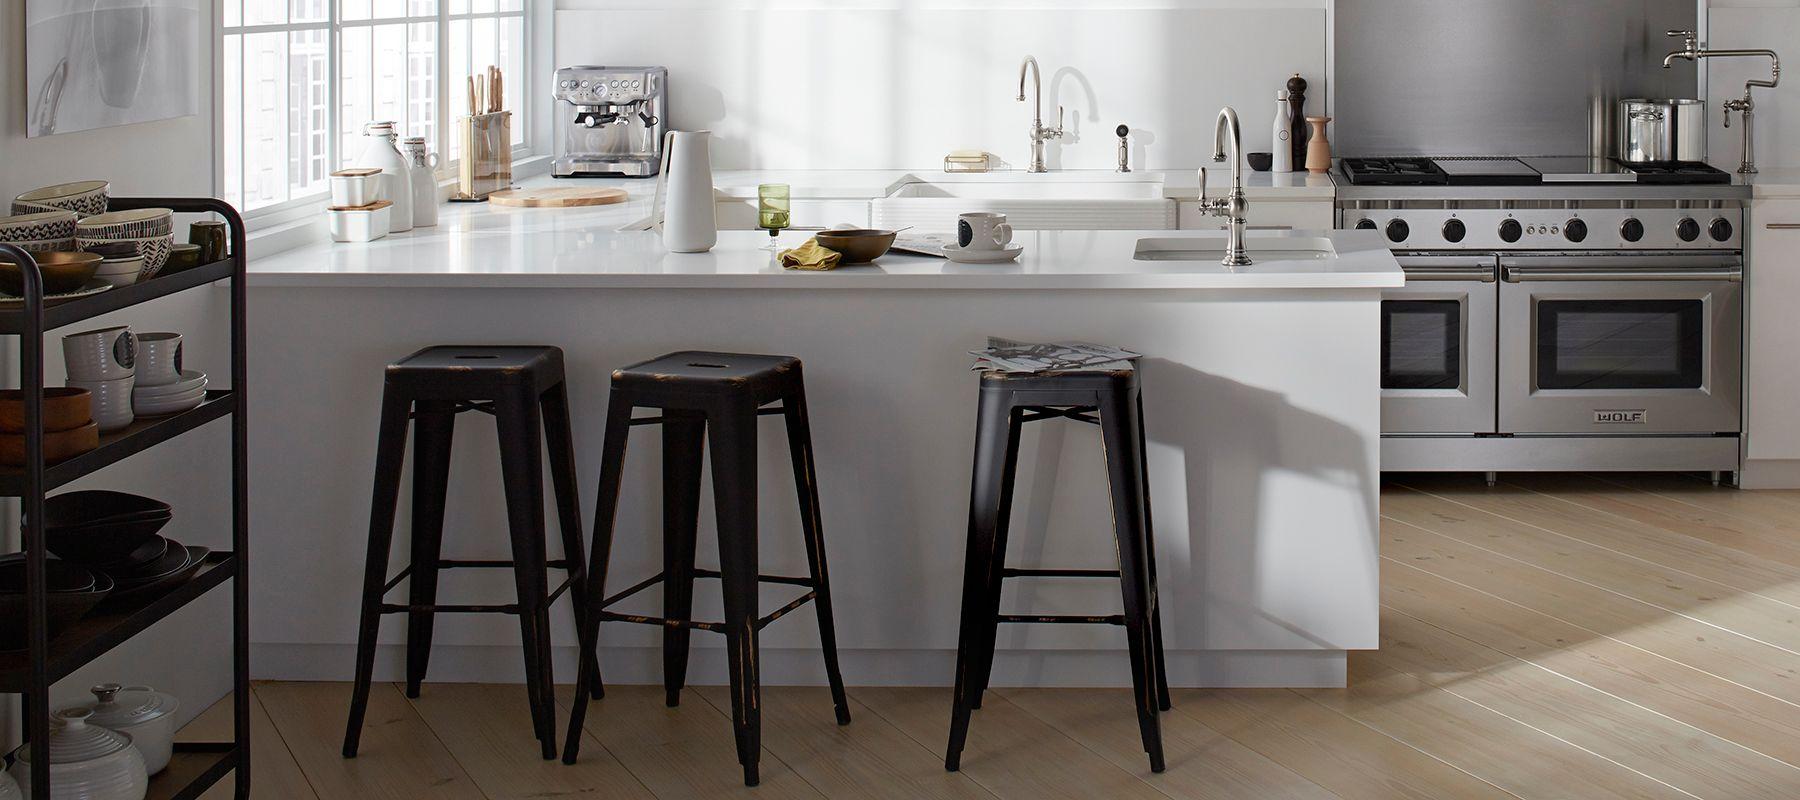 kitchen sinks and faucets cabinet kits sale sink kohler